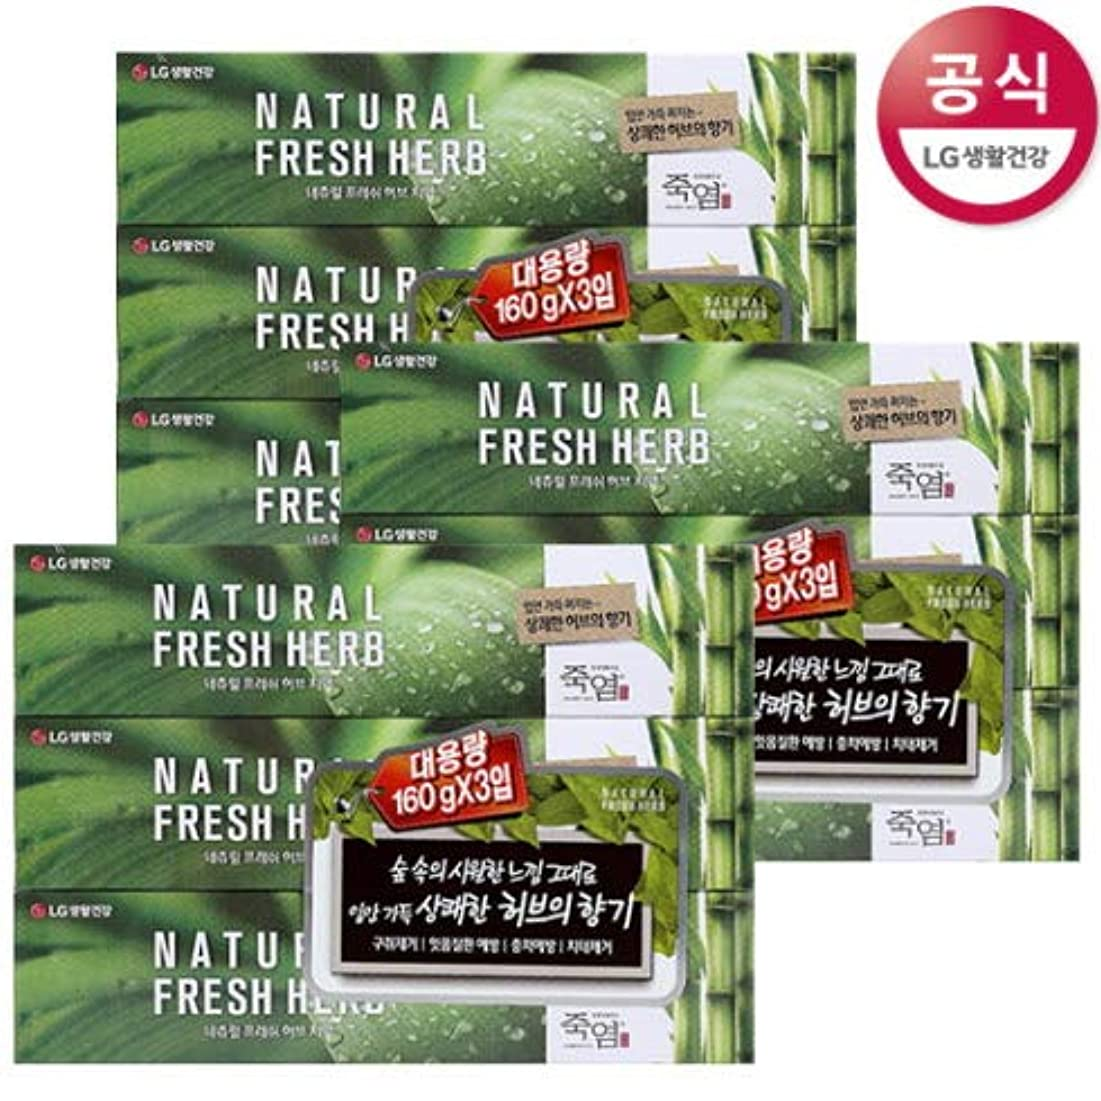 [LG HnB] Bamboo Salt Natural Fresh Herbal Toothpaste/竹塩ナチュラルフレッシュハーブ歯磨き粉 160gx9個(海外直送品)